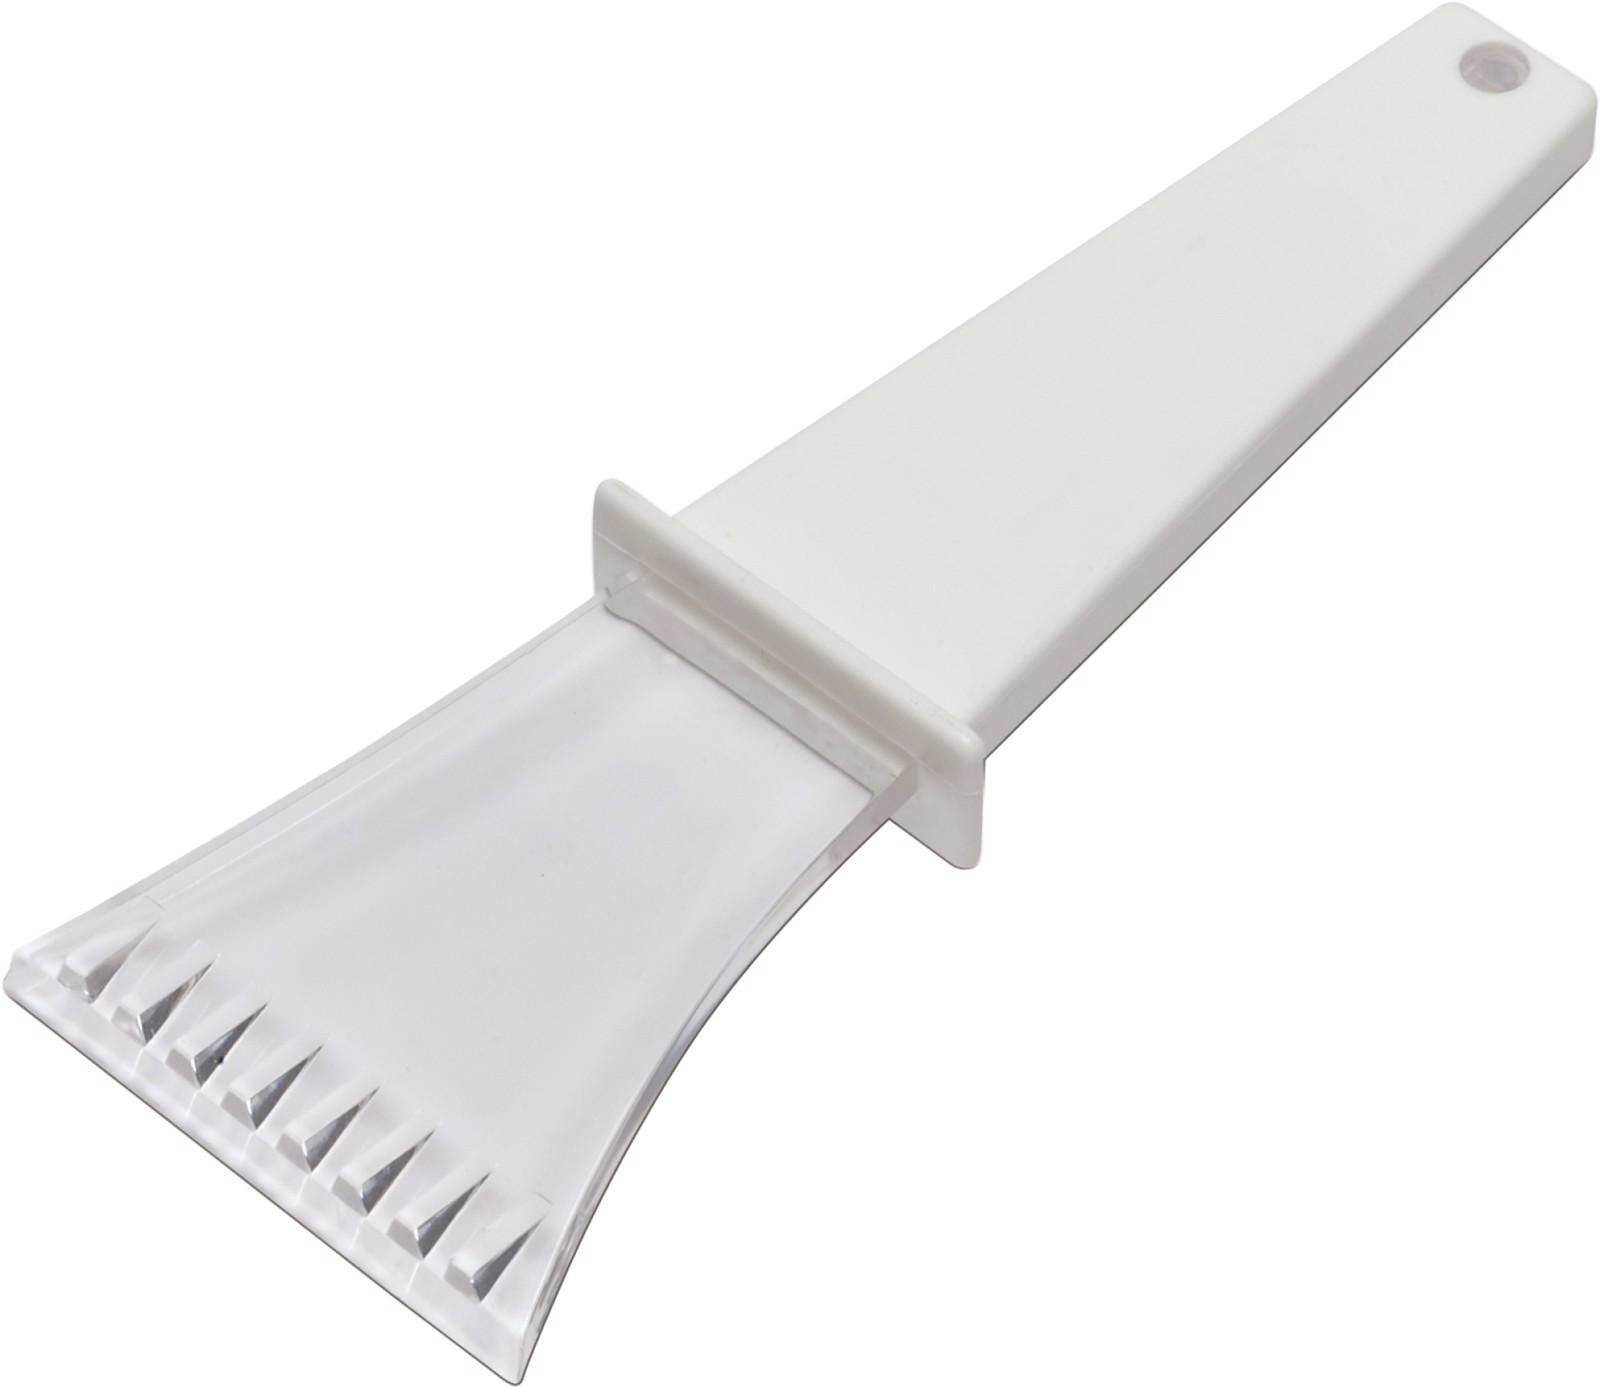 PP Ice scraper - White